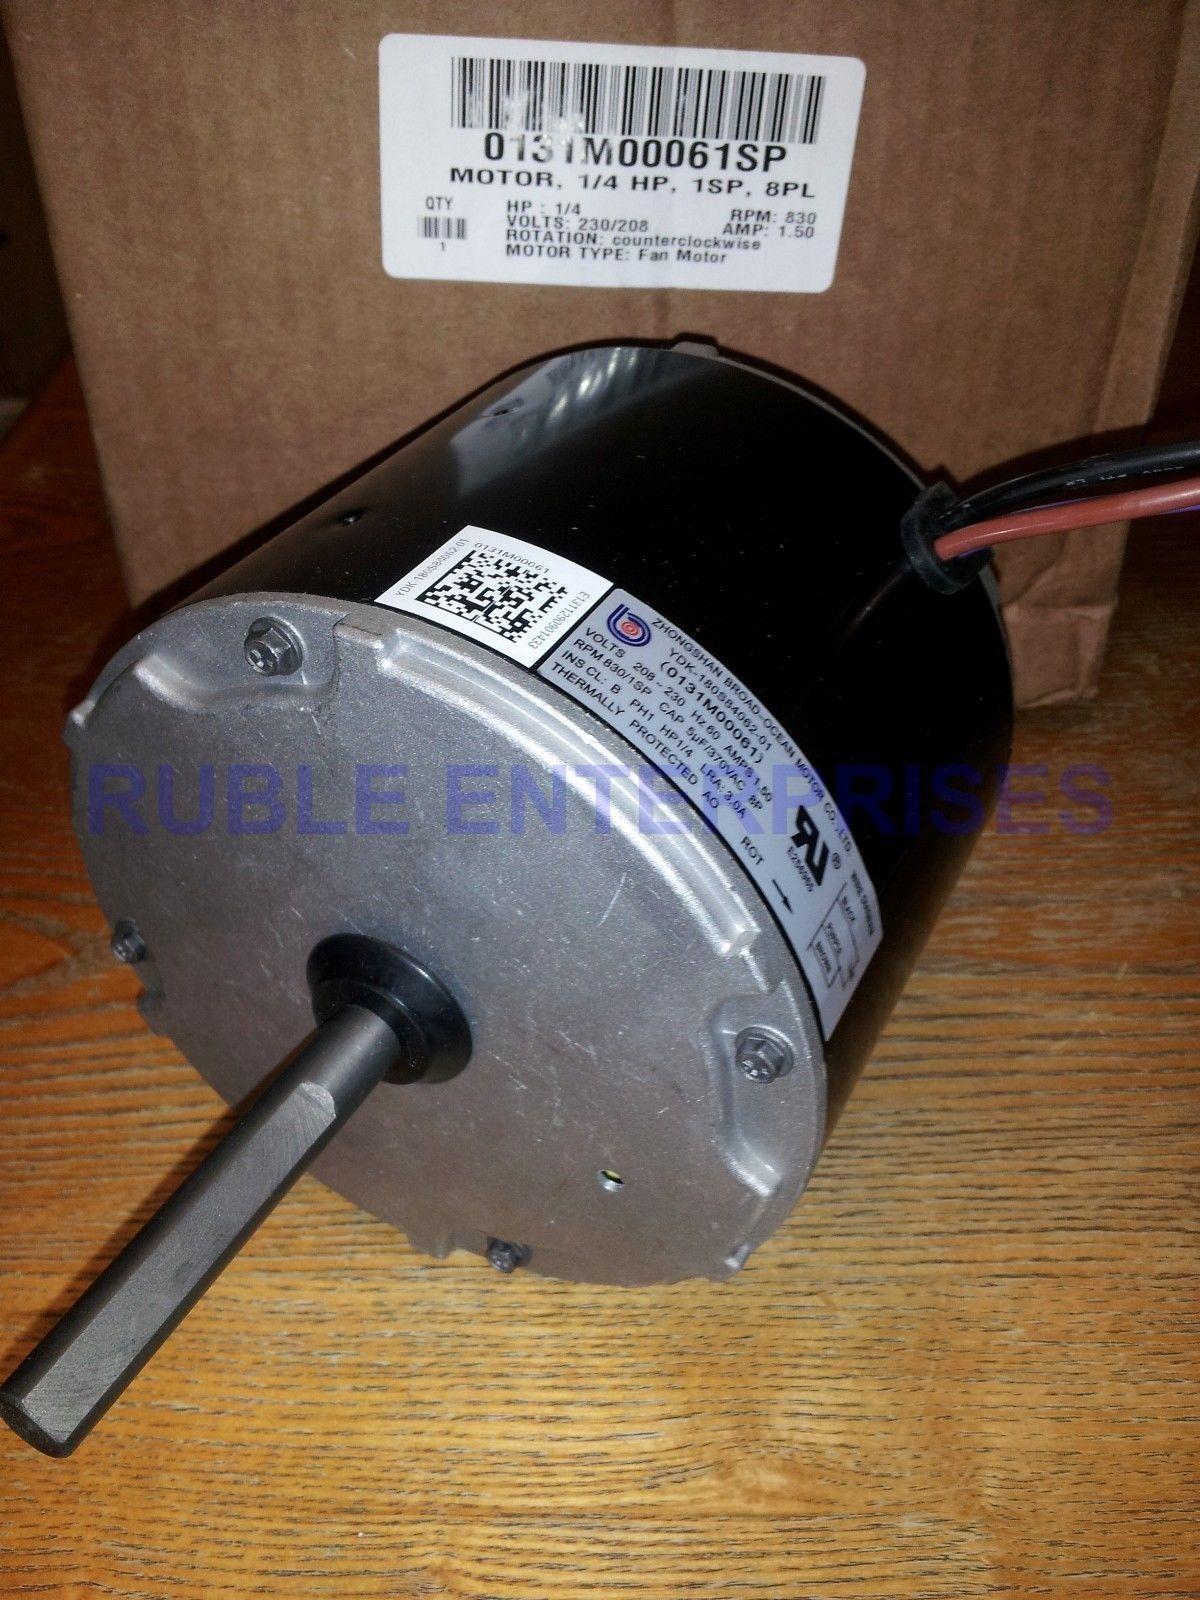 goodman amana condenser fan motor 0131m00061sp oem warrantygoodman amana condenser fan motor 0131m00061sp oem warranty